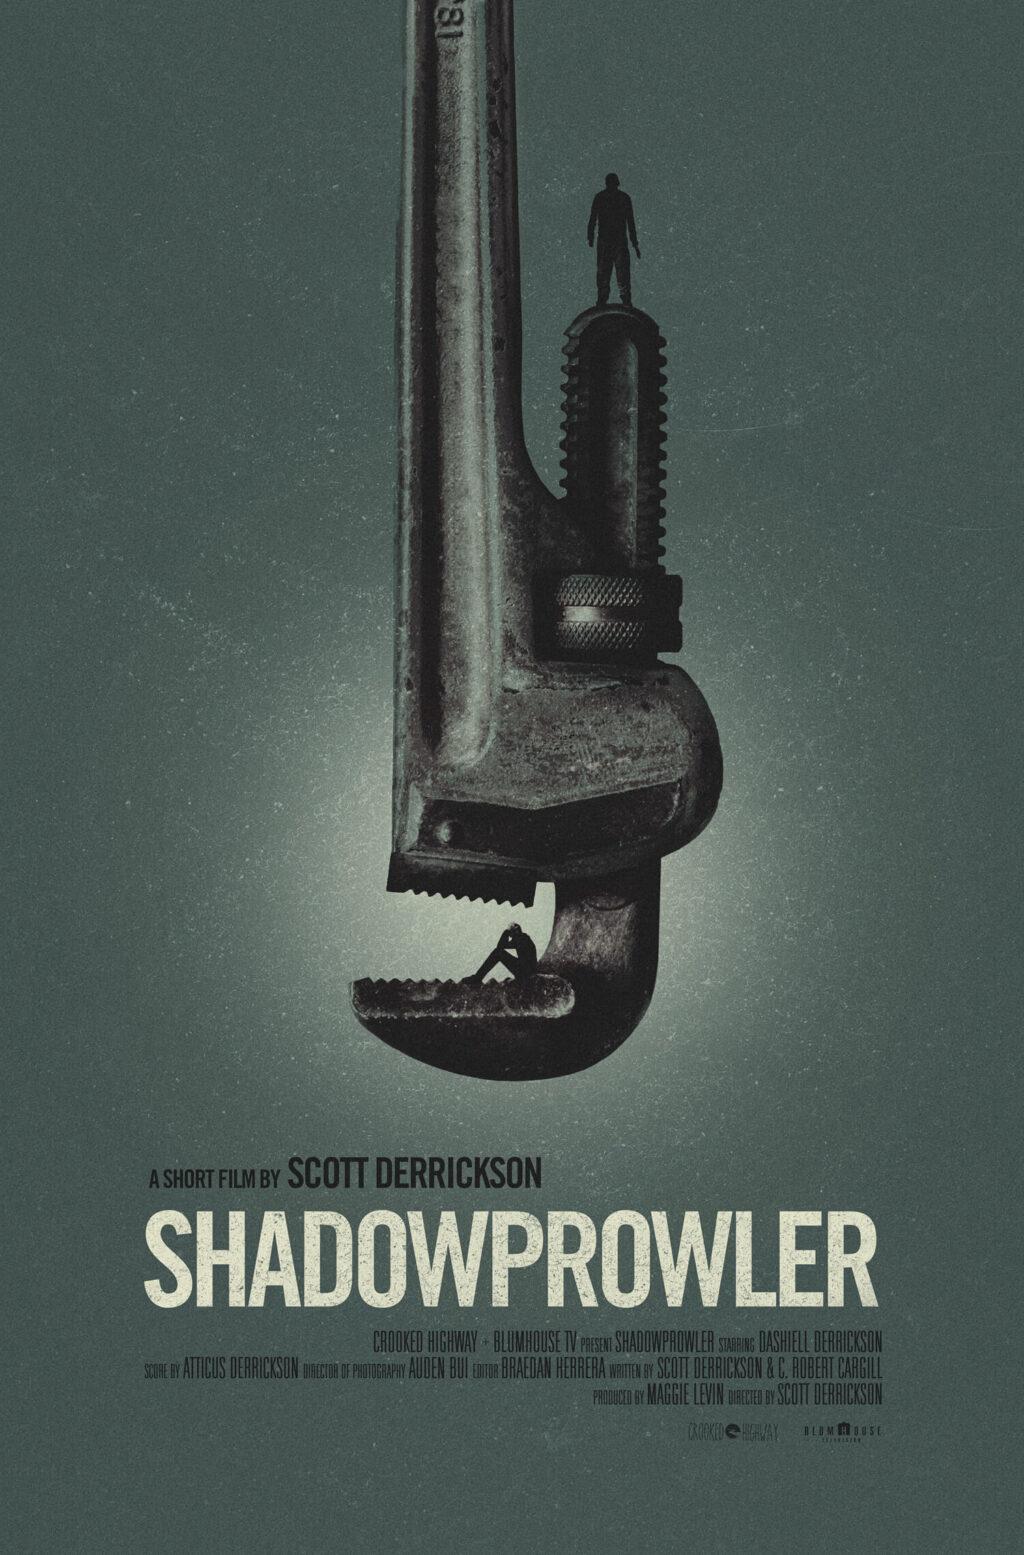 shadowprowler 1 1024x1555 - FrightFest 2021 Review: 'Shadowprowler' Is An Effective Home Invasion Thriller From Director Scott Derrickson